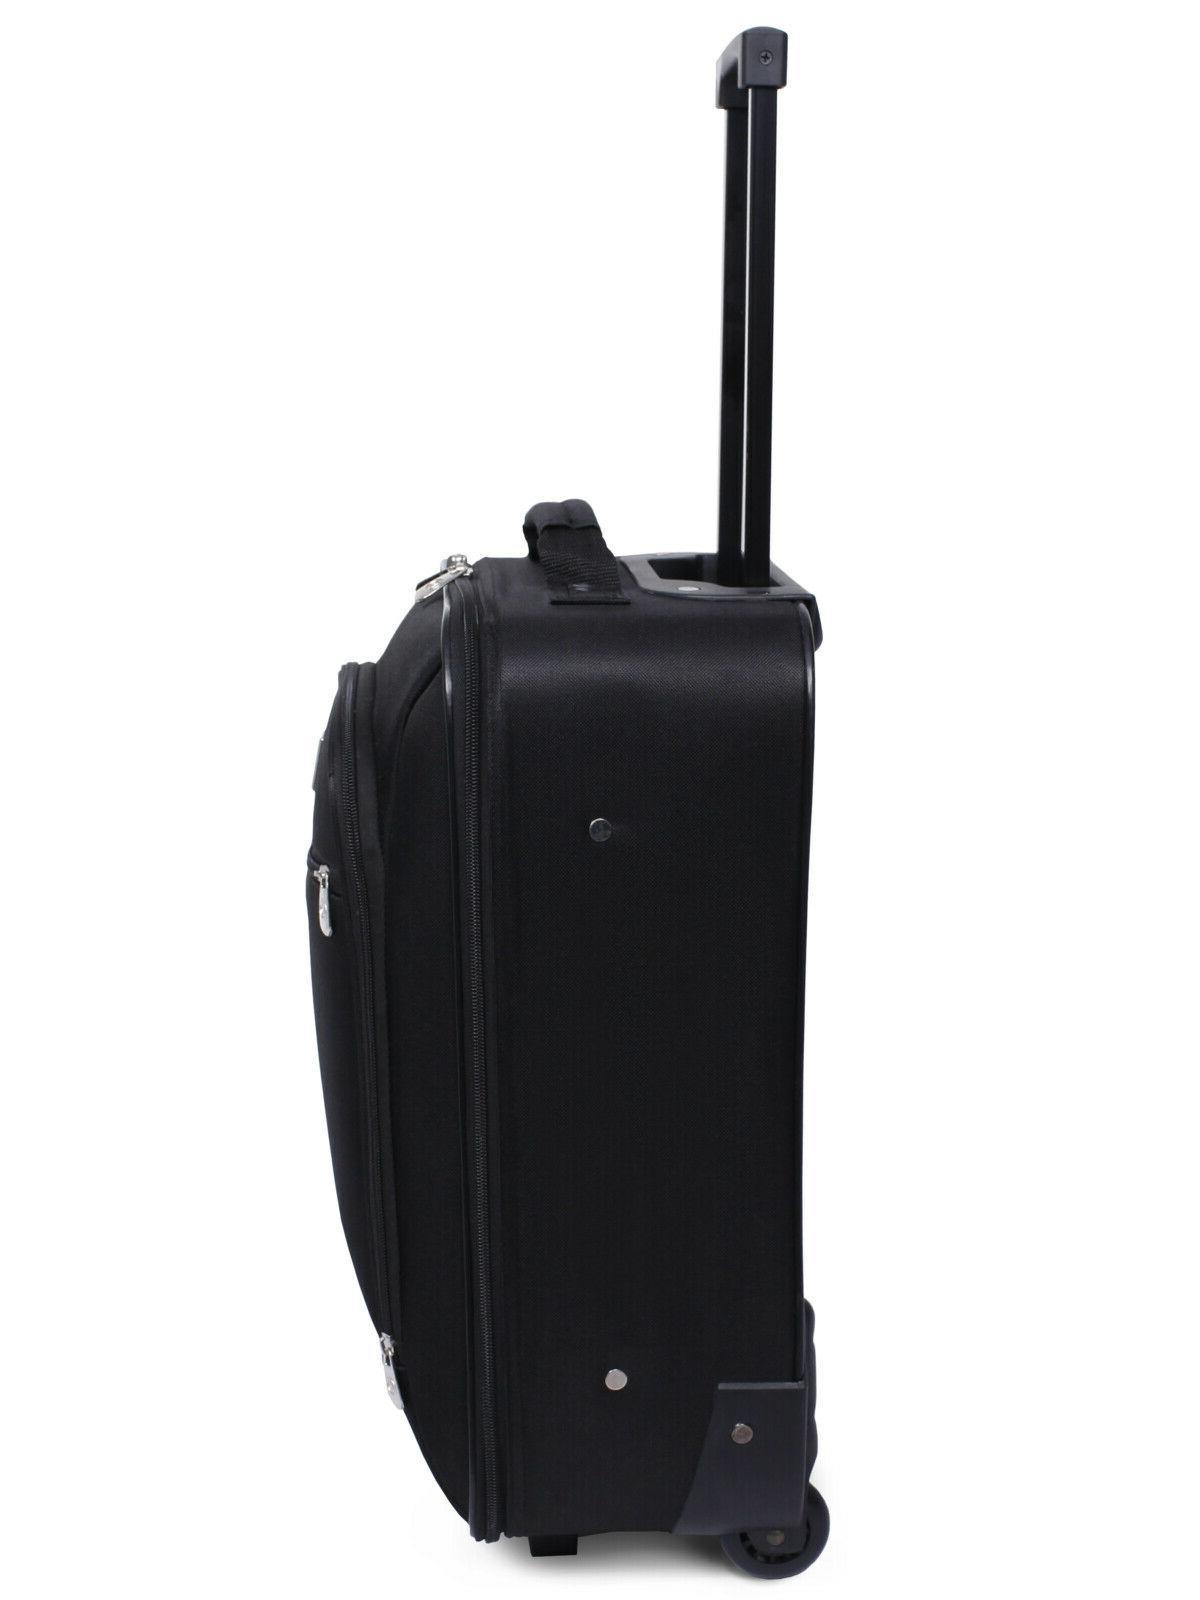 Pilot Upright Handle Luggage Travel Bag Black 18-Inch